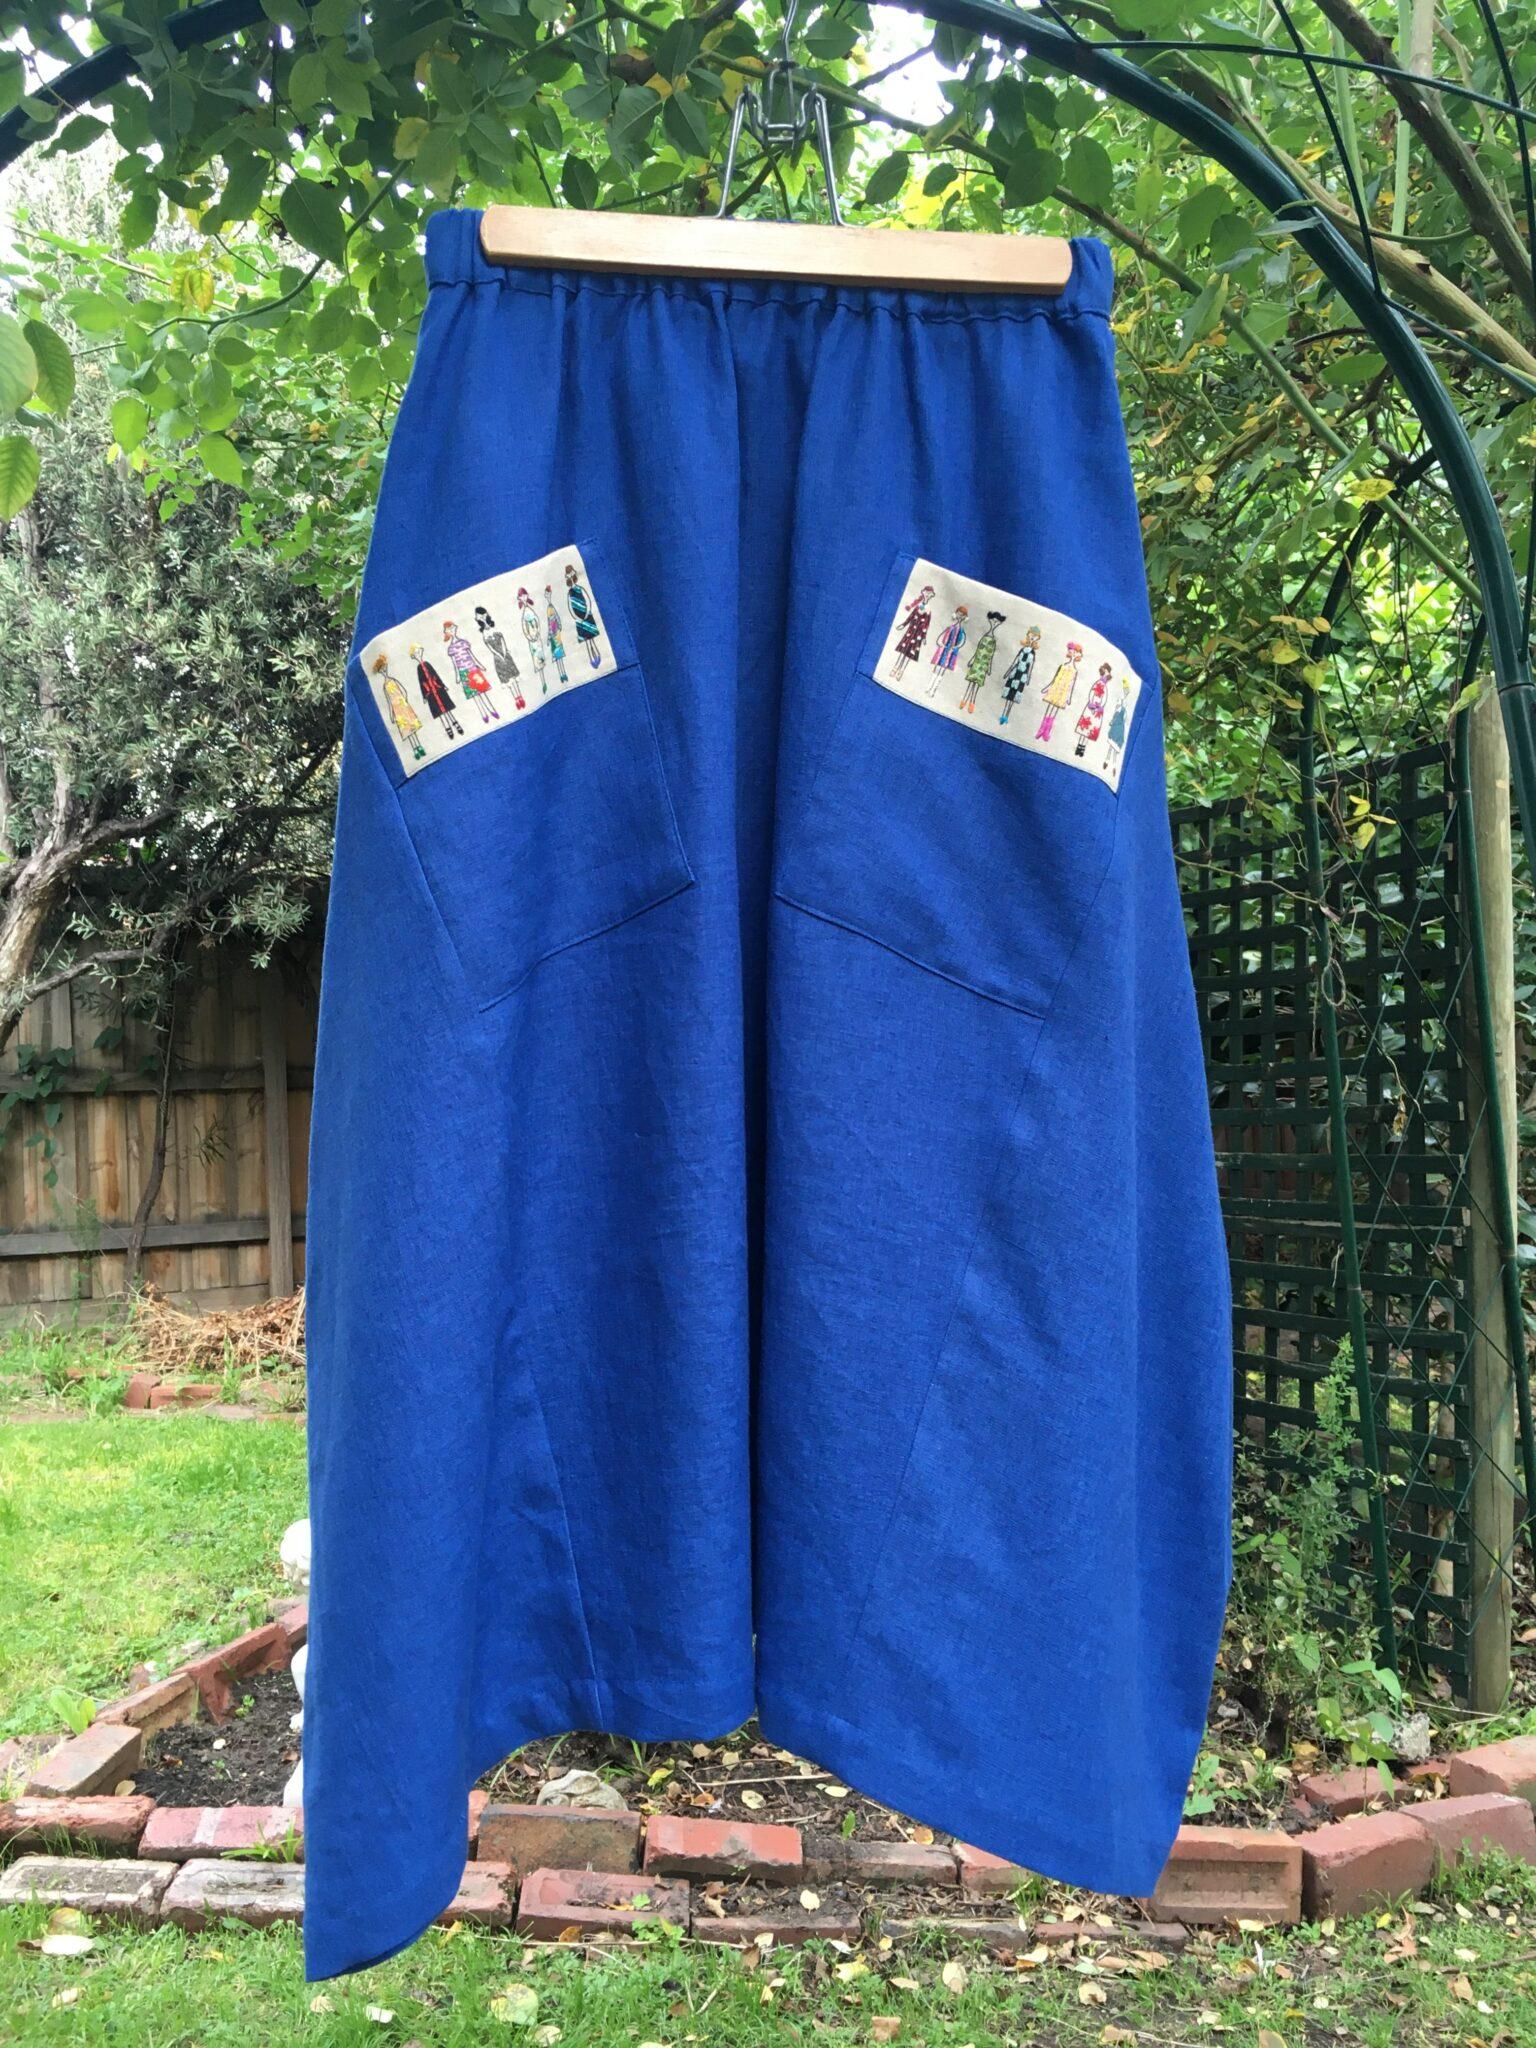 Ohana Skirt With Embroidered Pockets (Blue) By à Pois